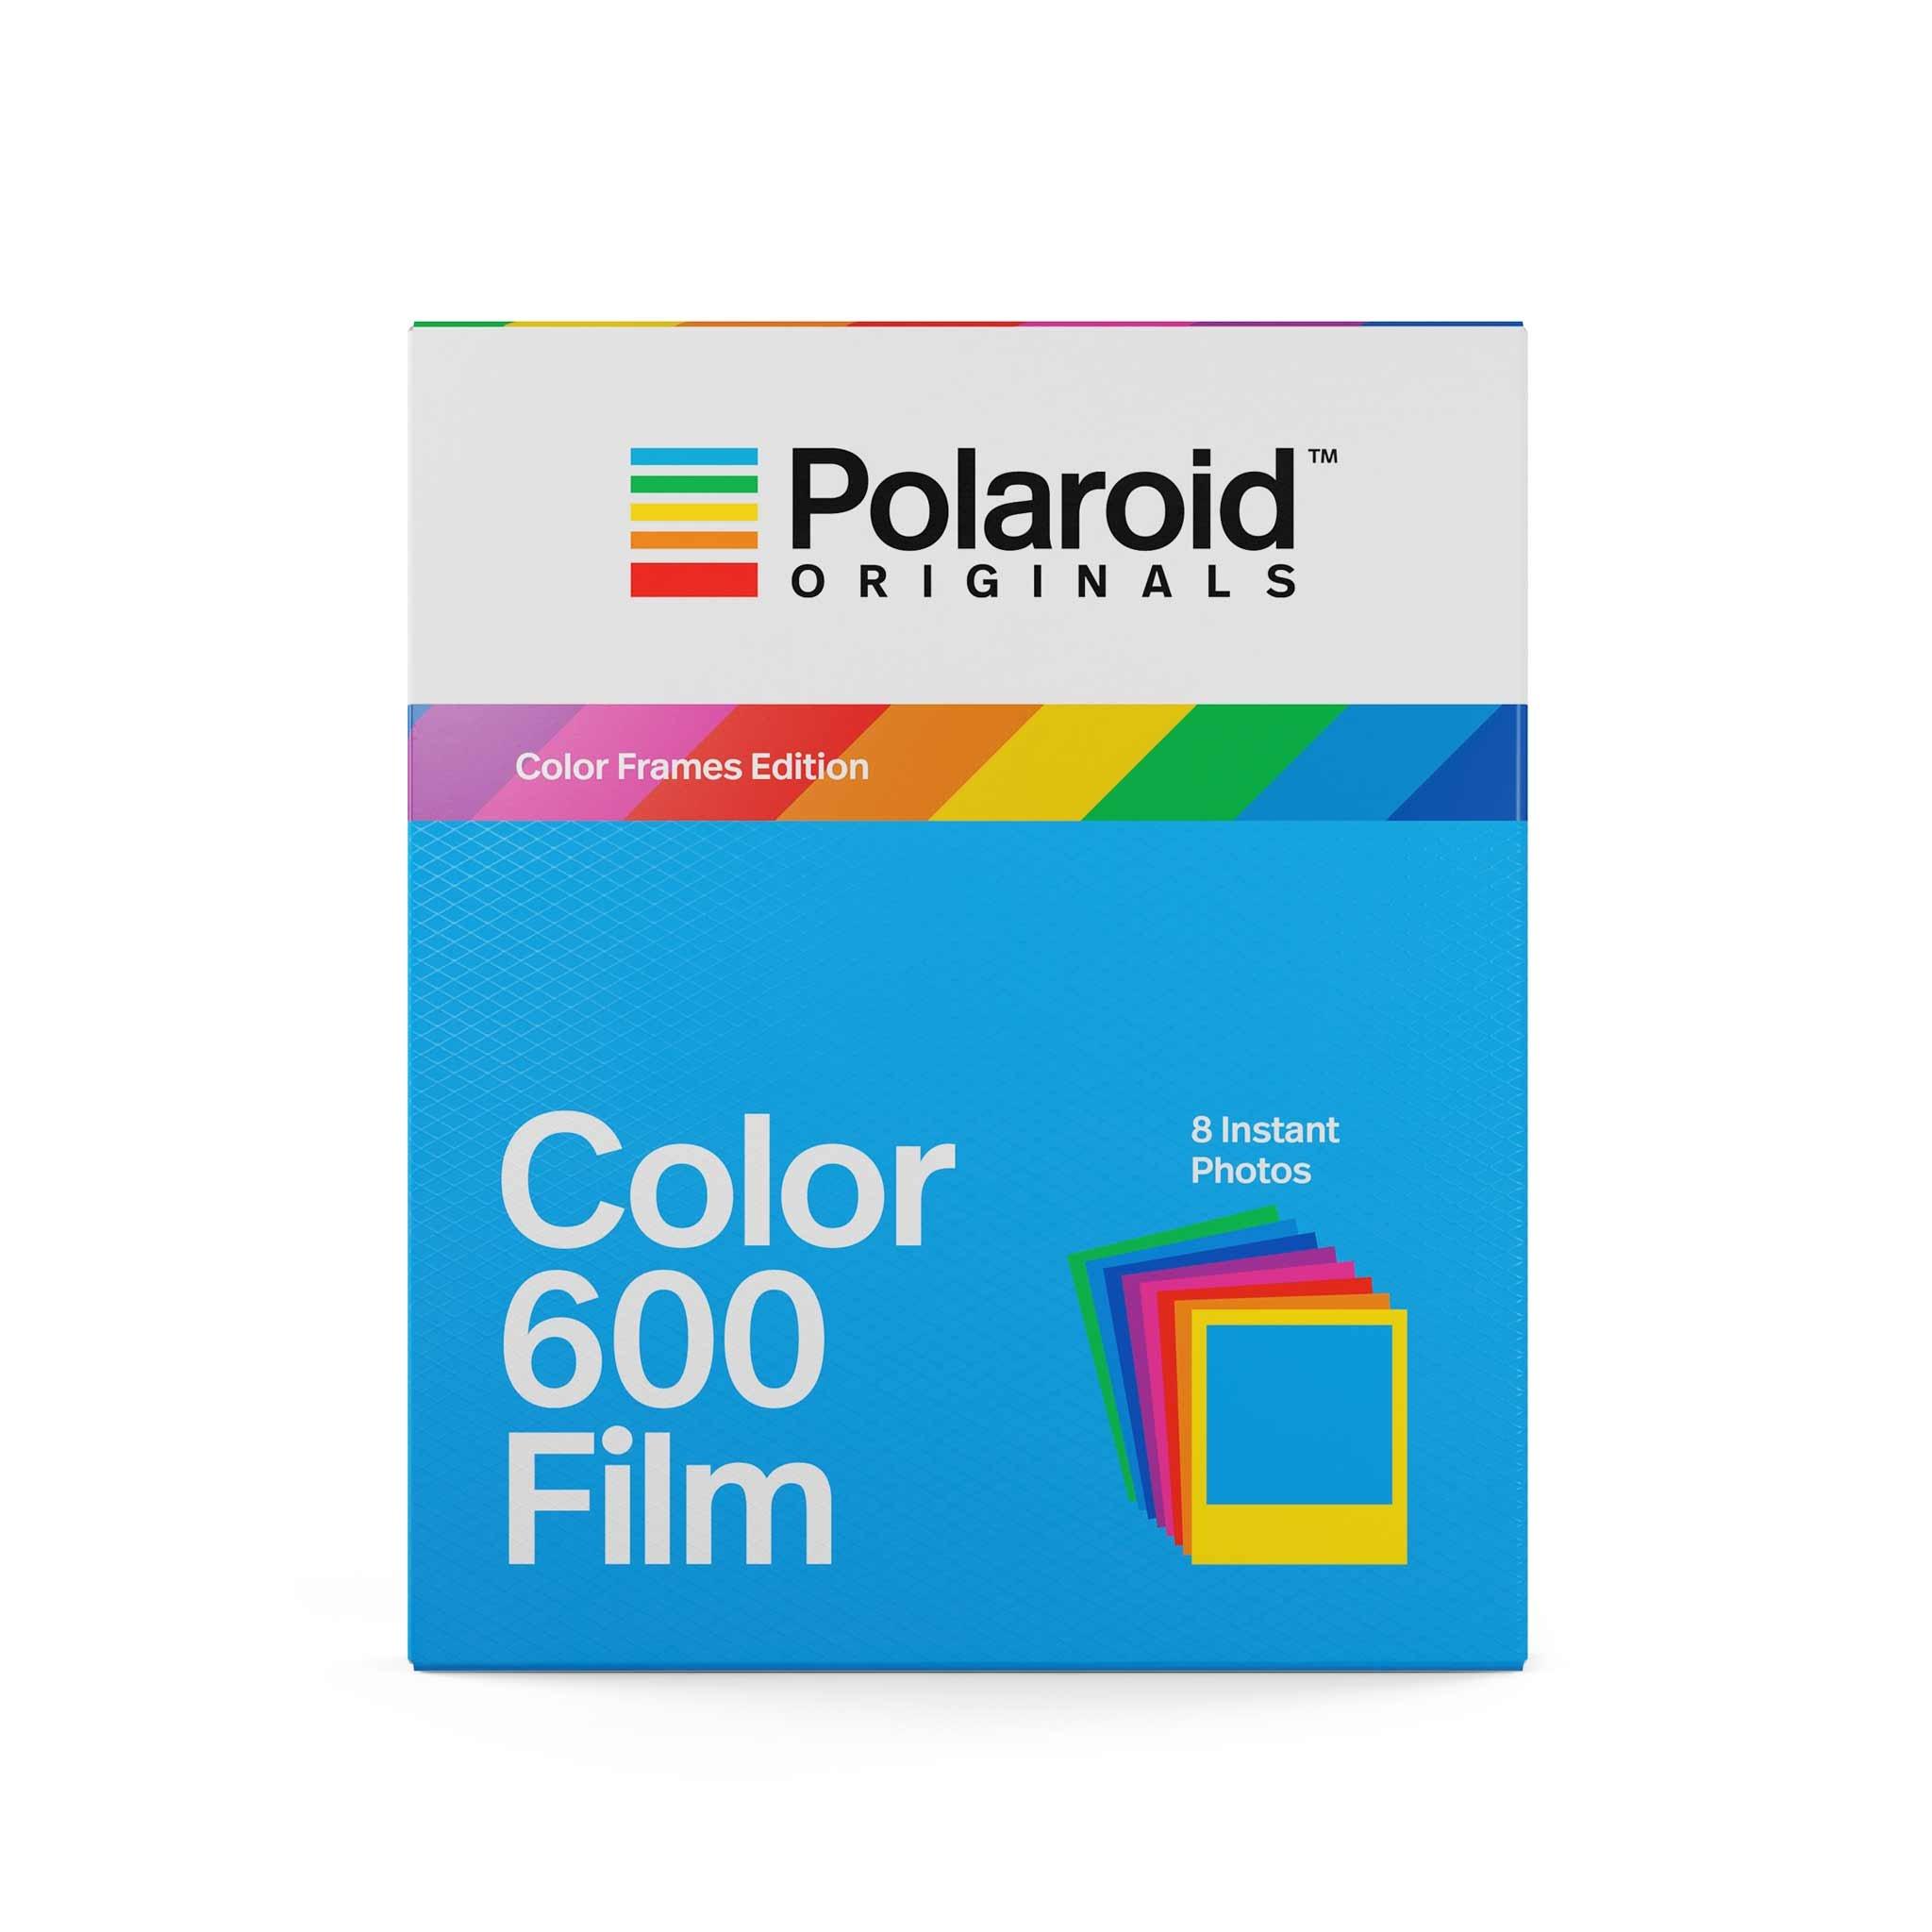 Polaroid Color 600 Film Color Frames